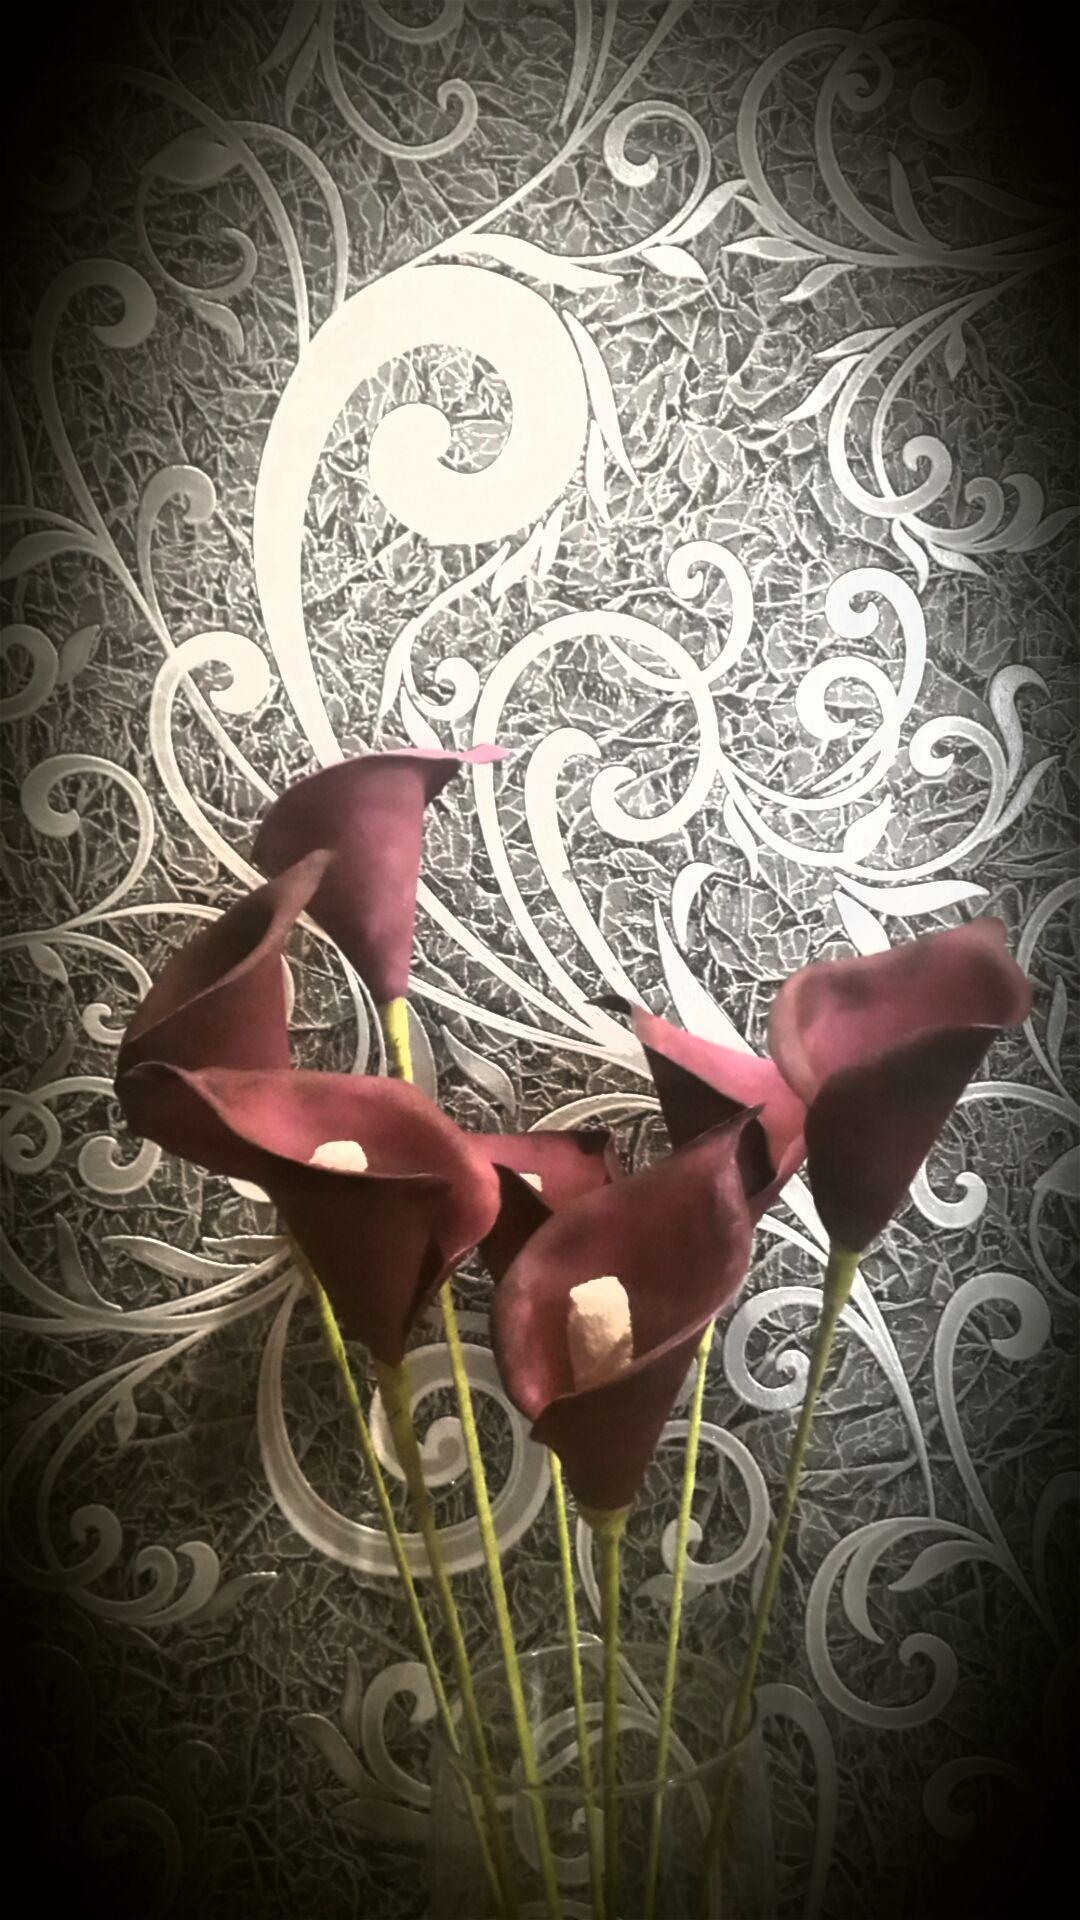 каллы длядома подарки искуственныецветы ручнаяработа